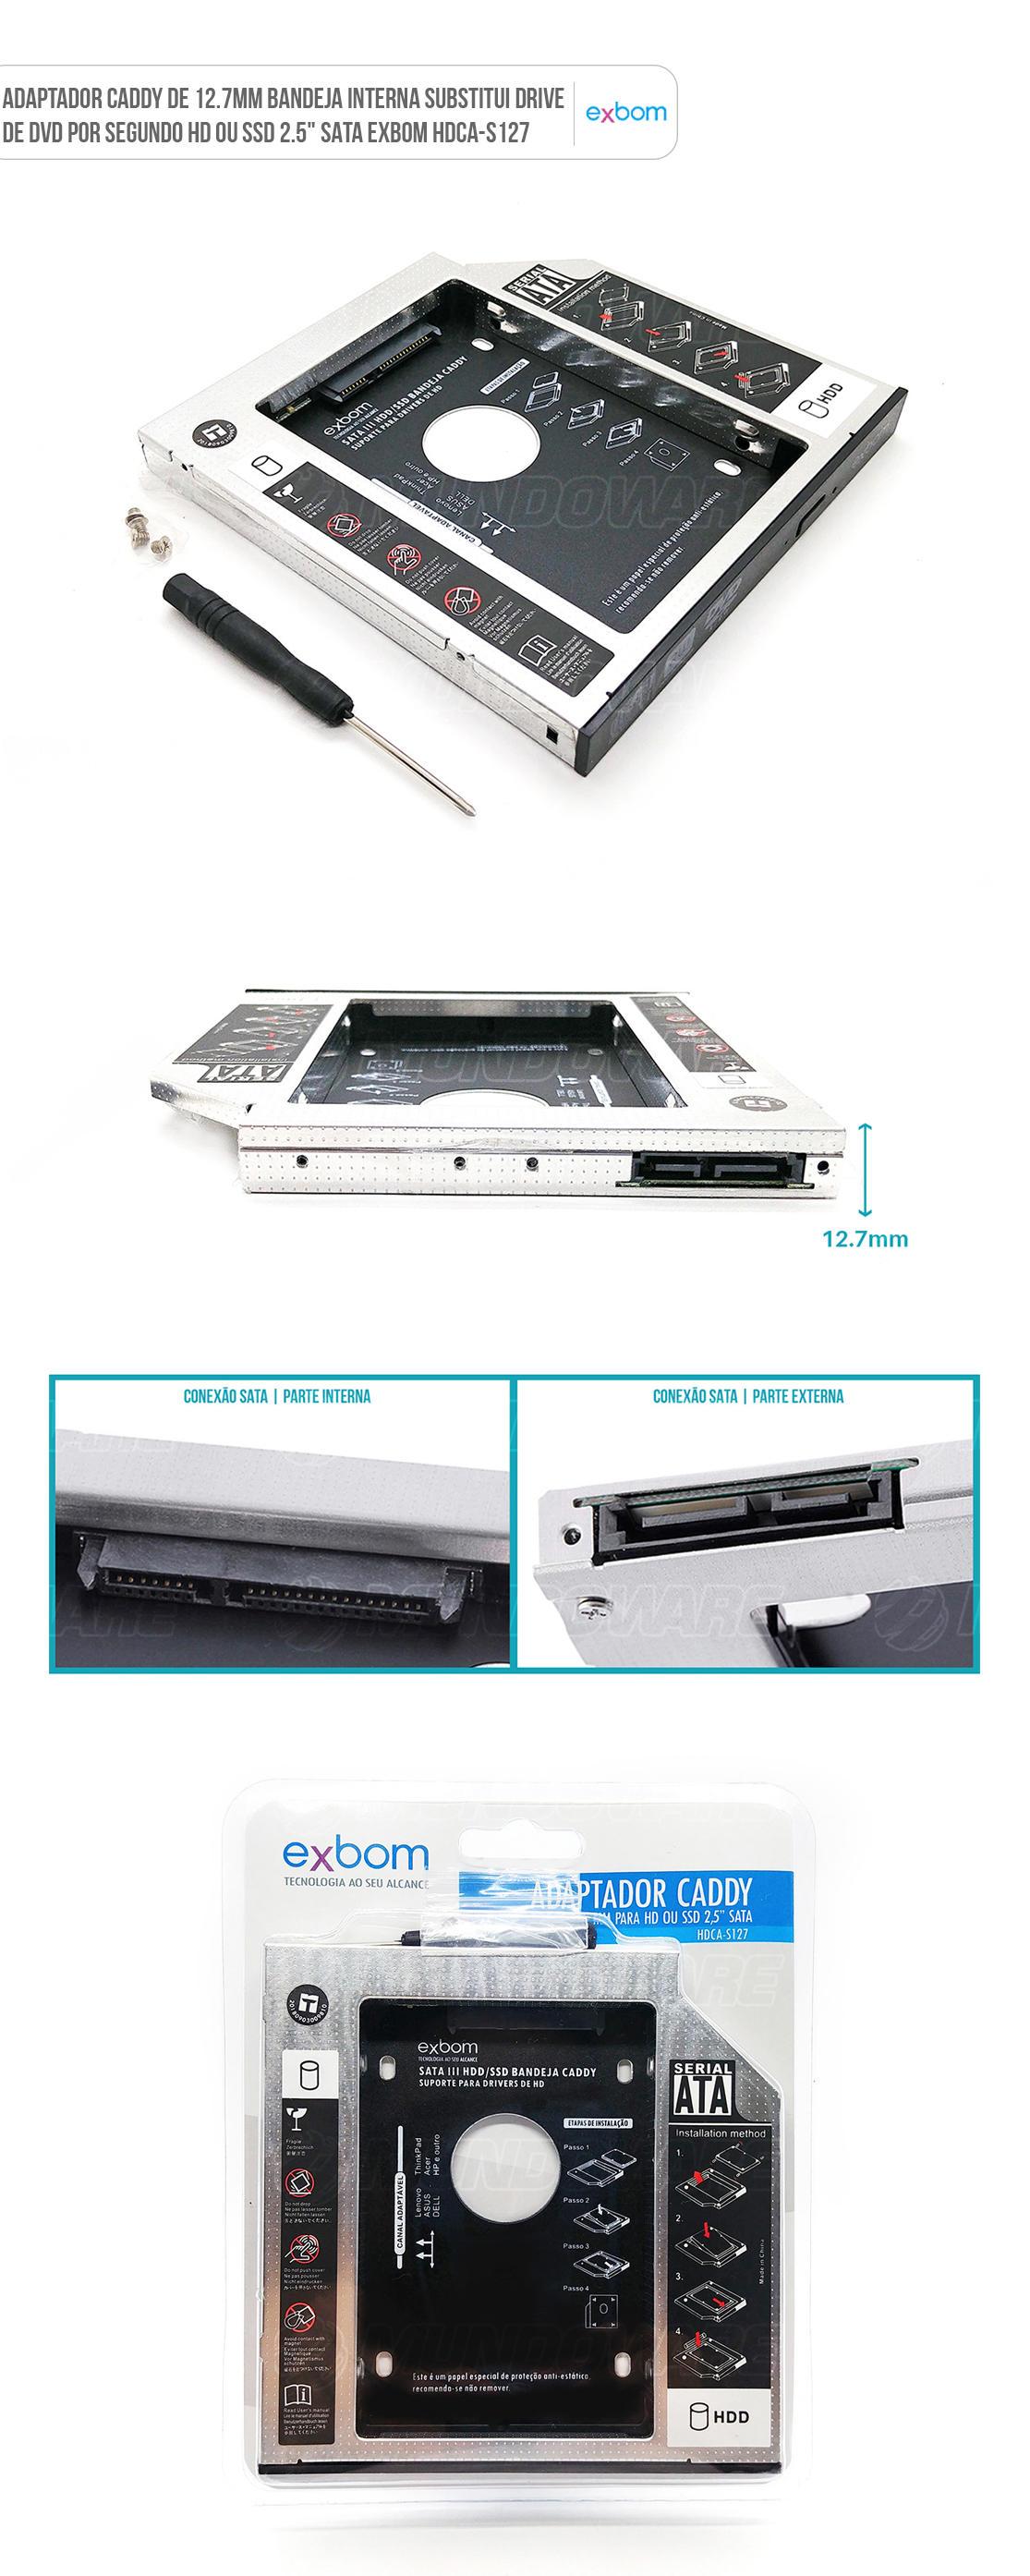 Bandeja Caddy para substituir drive DVD por segundo HD ou SSD de 12.7mm